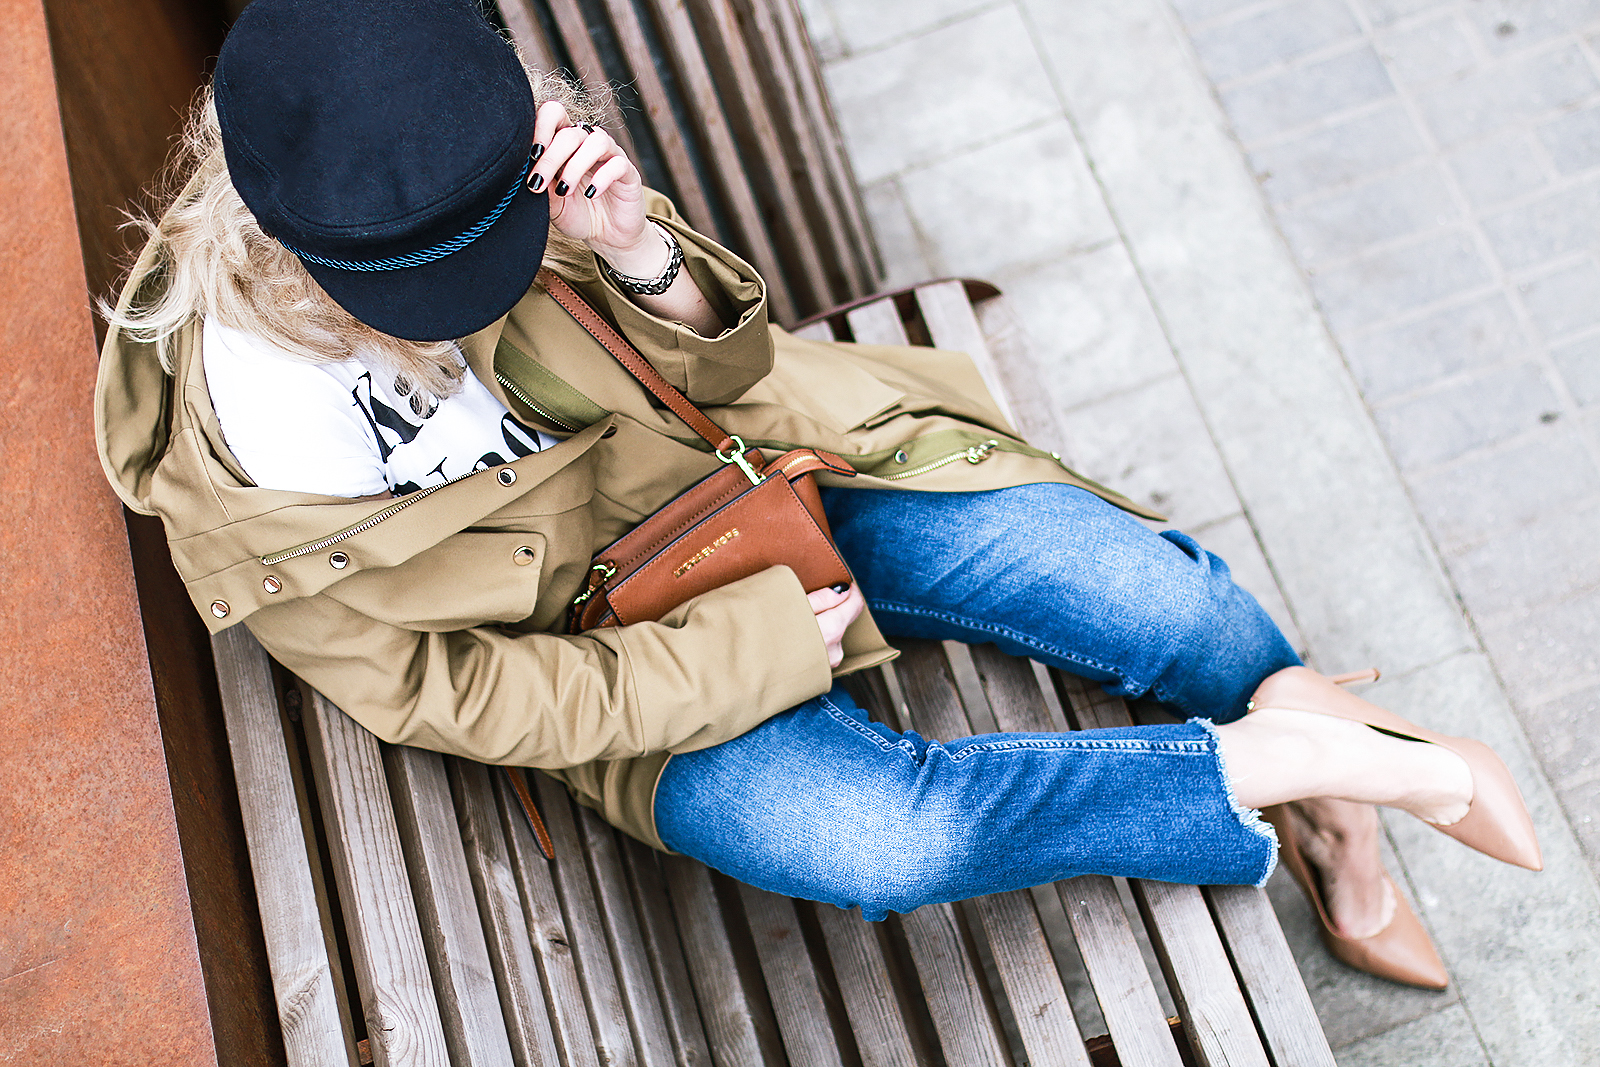 Margarita_Maslova_Ritalifestyle_Fashion_blogger_Moscow_MK_bag_parka_jacket_kepi_croped_jeans_nude_heels